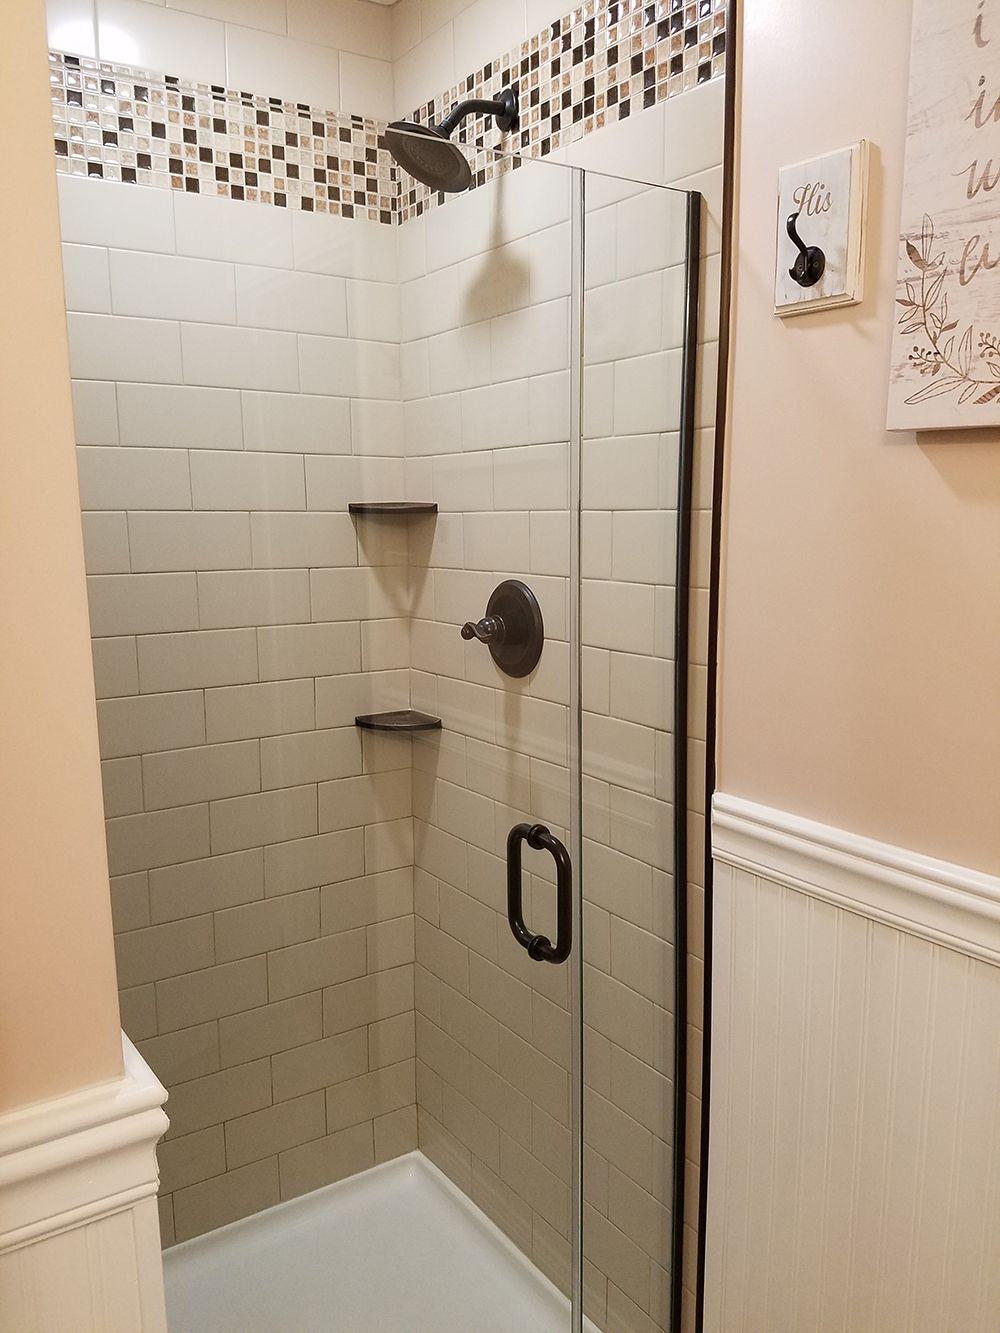 "Rustic Farmhouse Bathroom Wall tile is Daltile 4"" x 8"